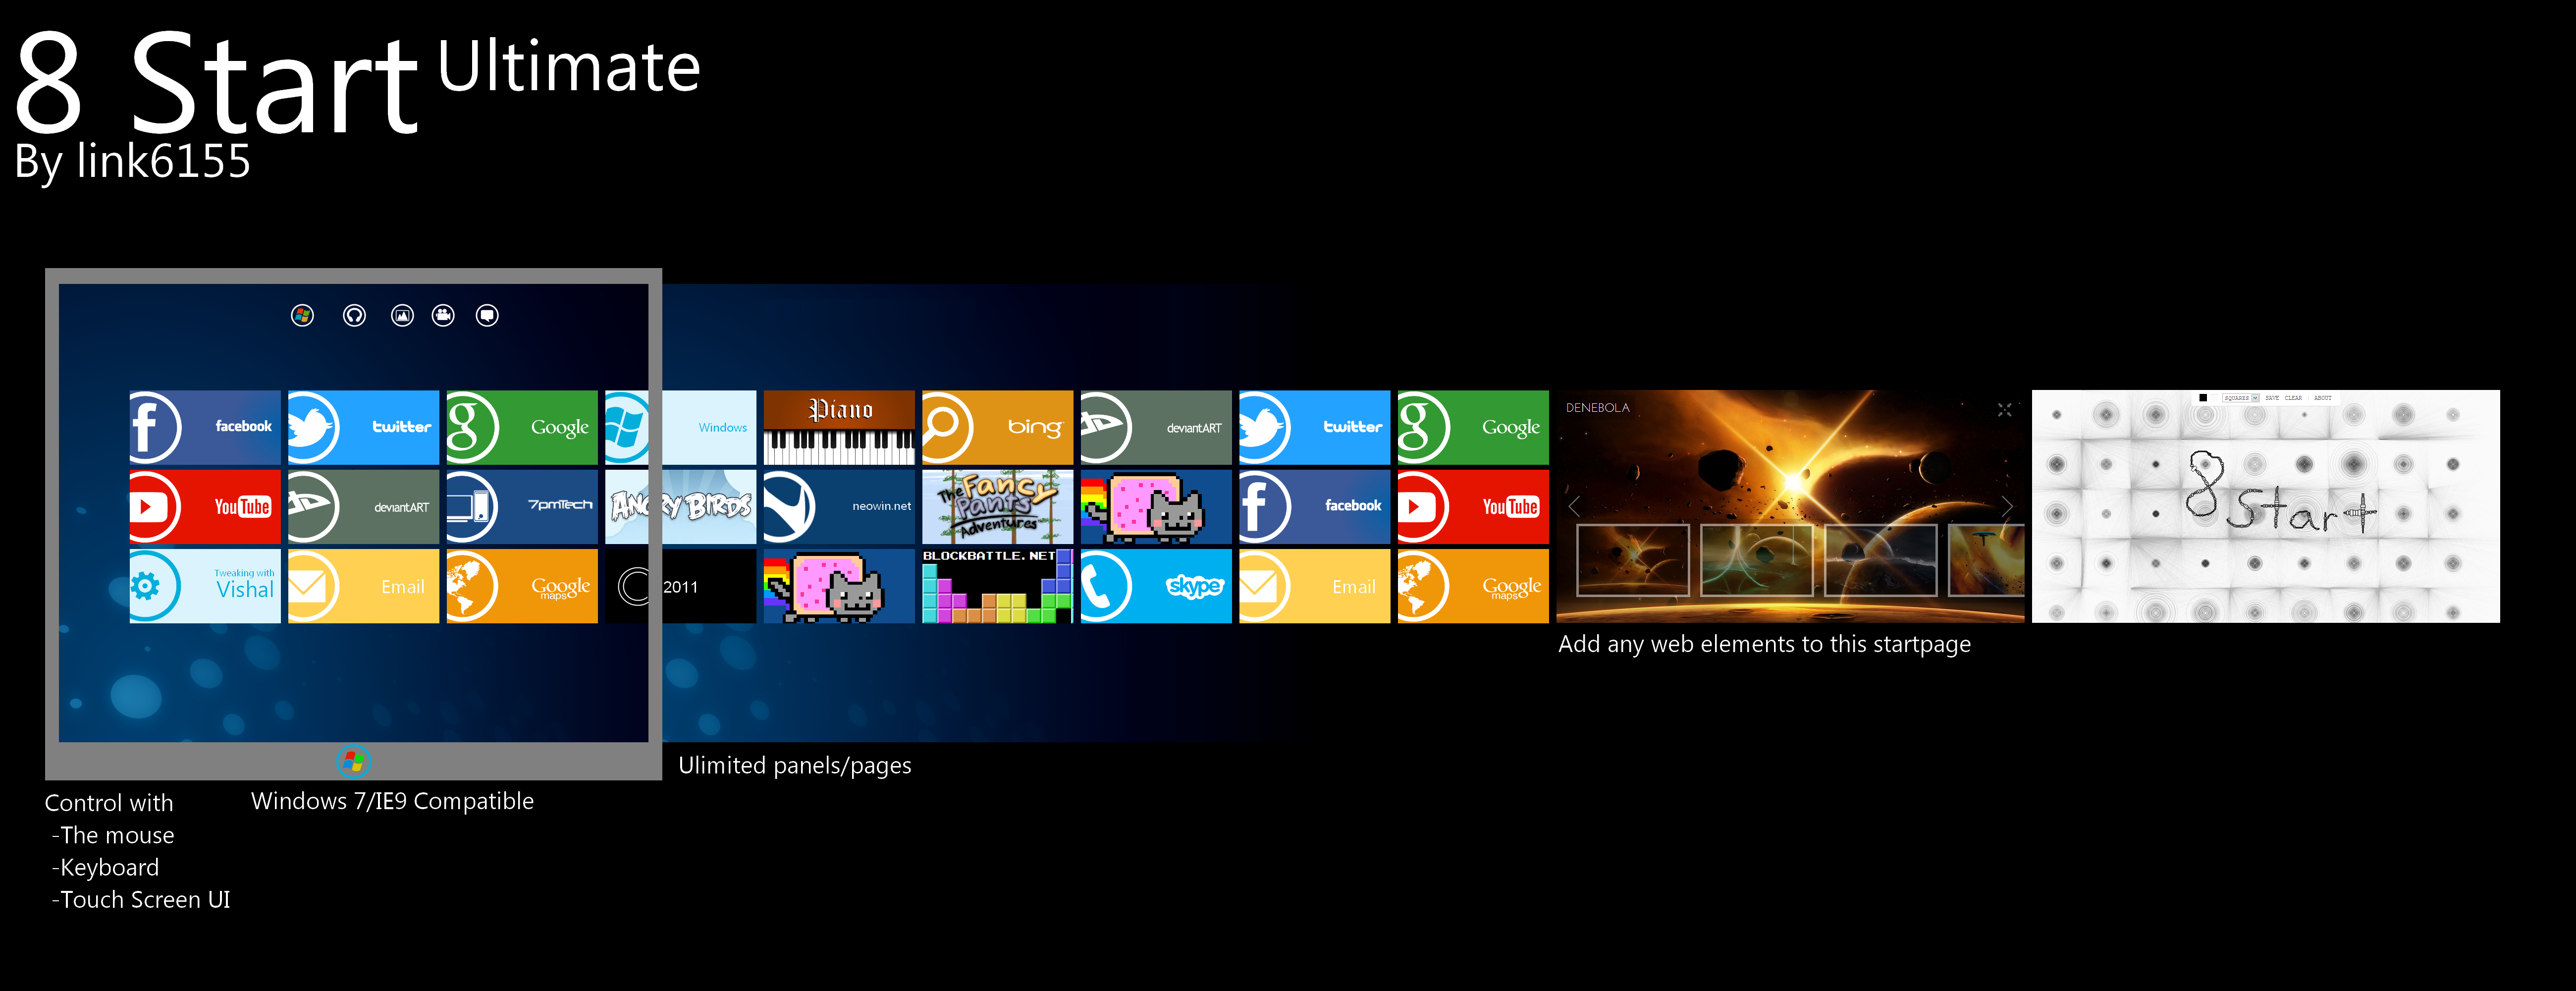 Windows 8 Ultimate